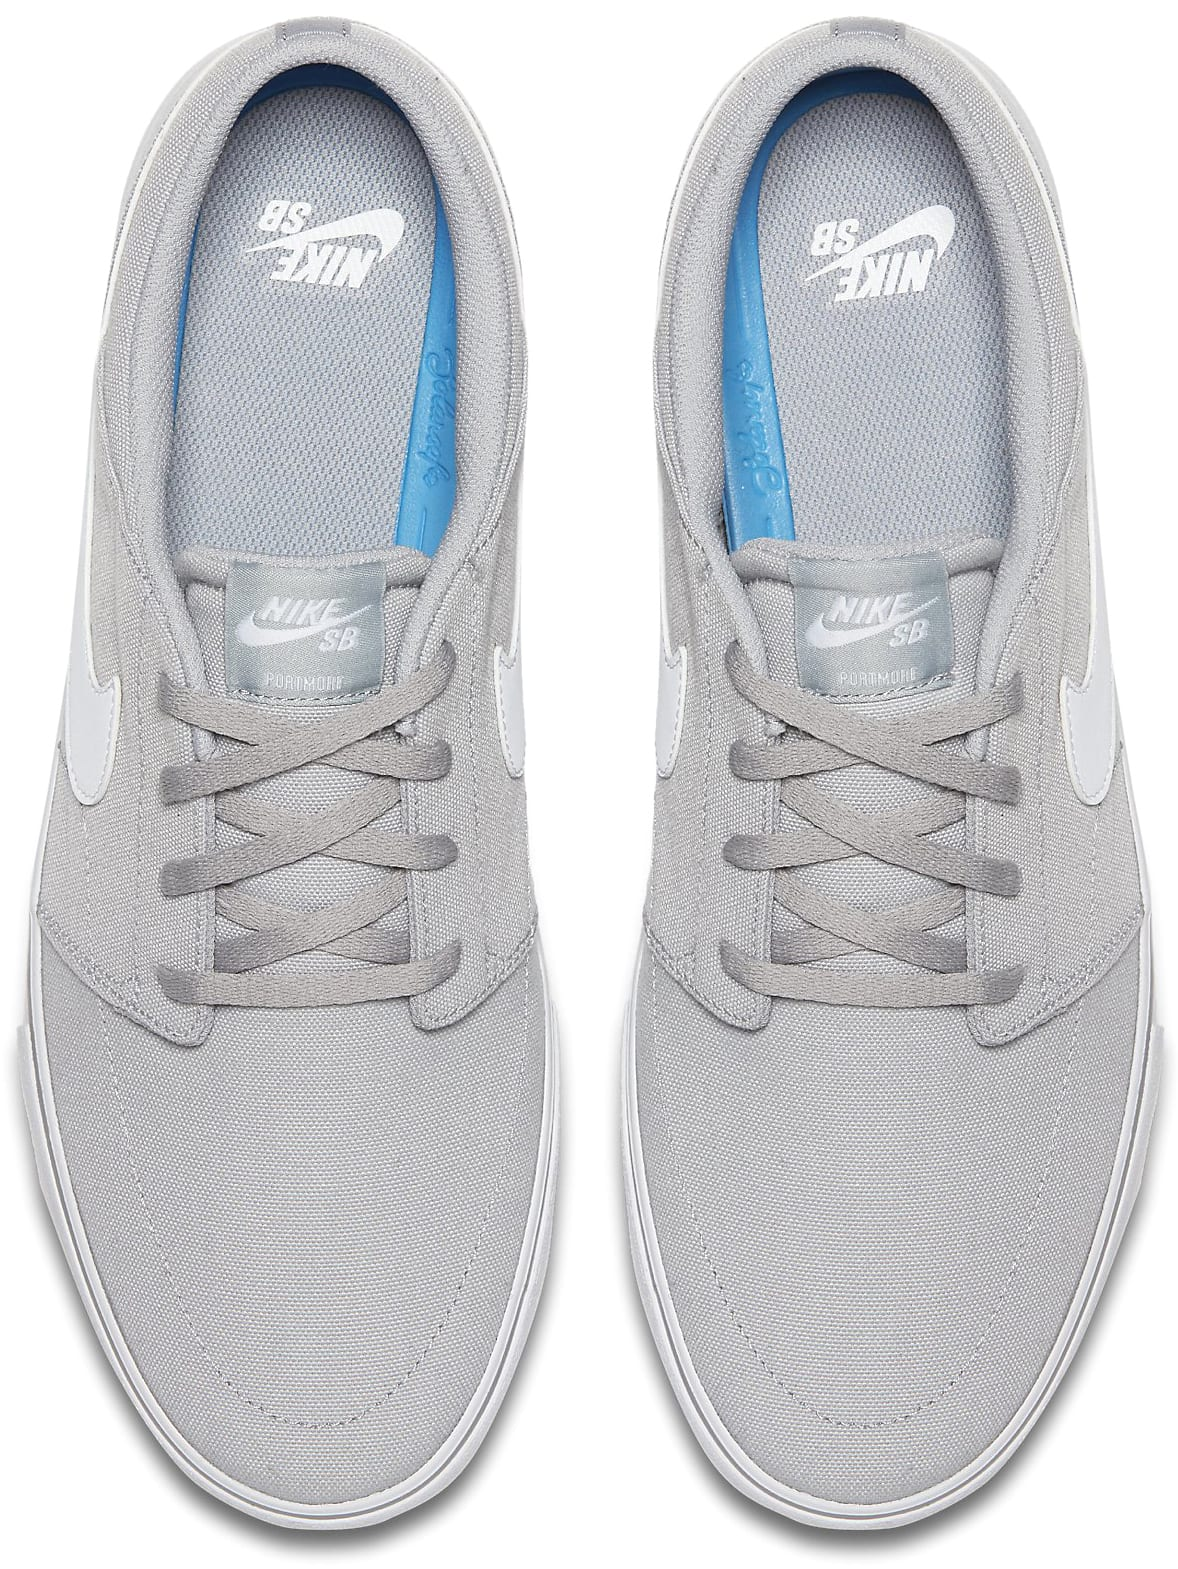 58609d54f930 Nike SB Portmore II Solarsoft Canvas Skate Shoes - thumbnail 4